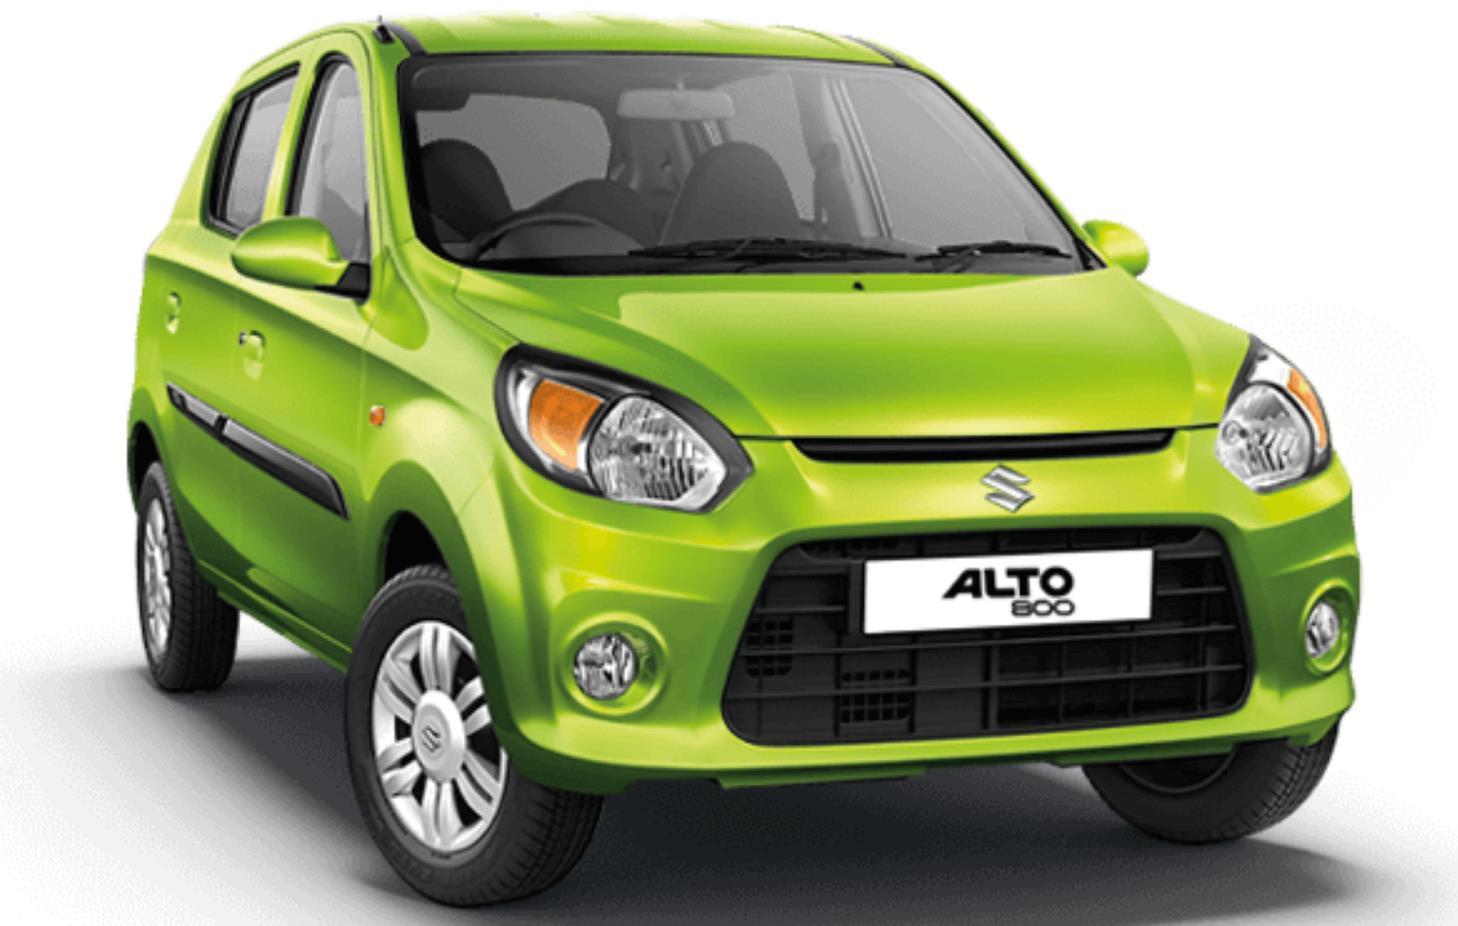 Suzuki Alto 2018 exterior